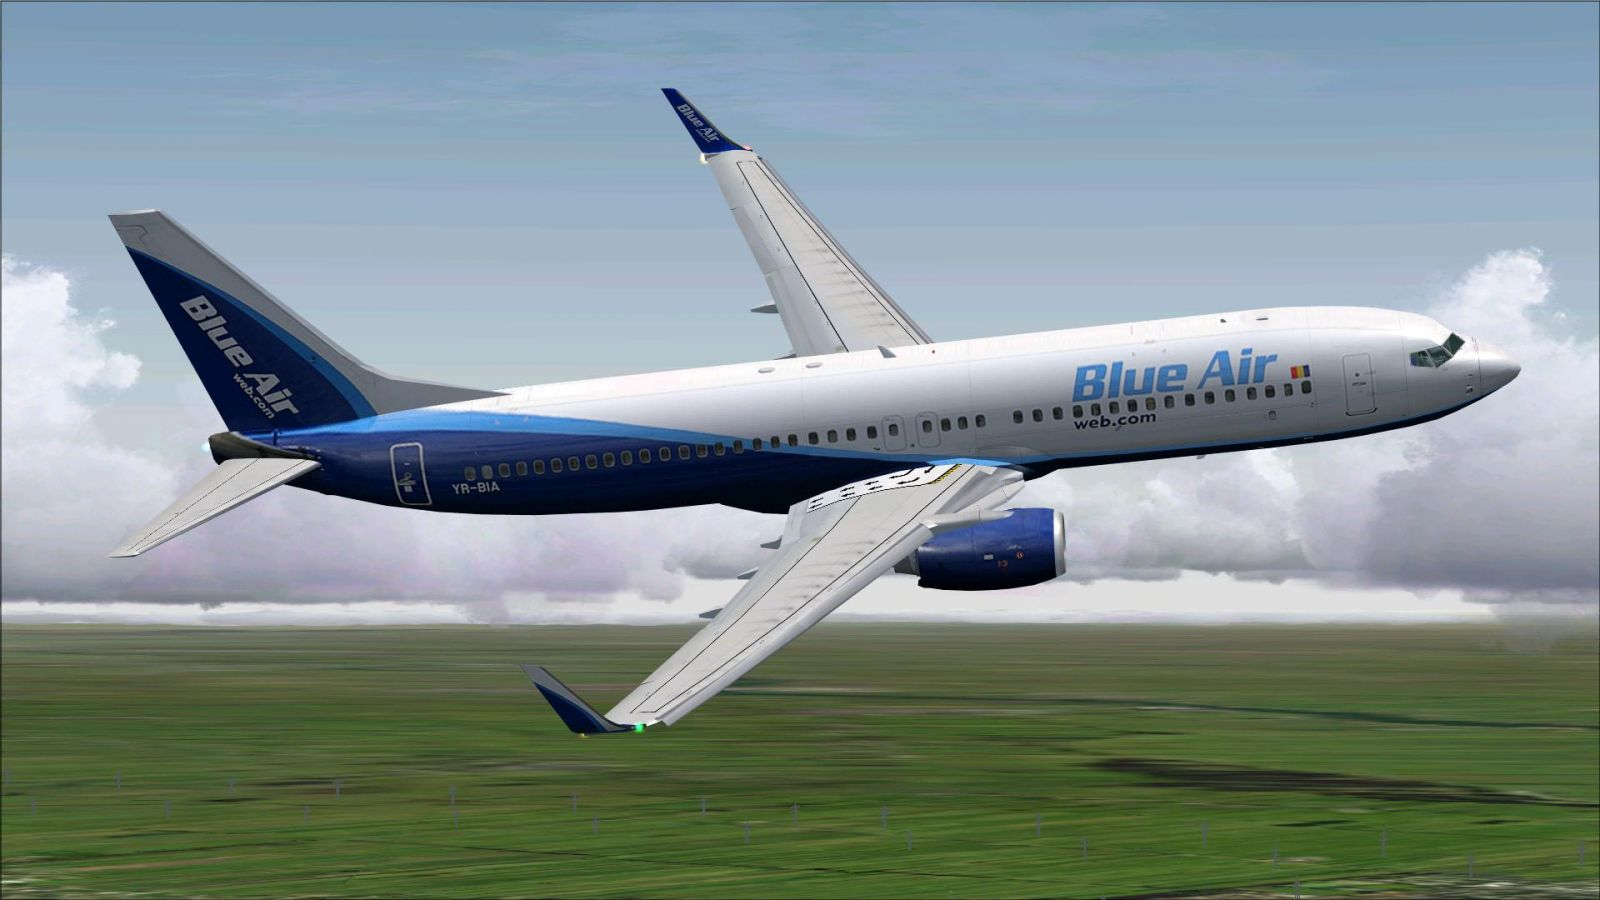 Blue Air Web.com Boeing 737-800 for FSX